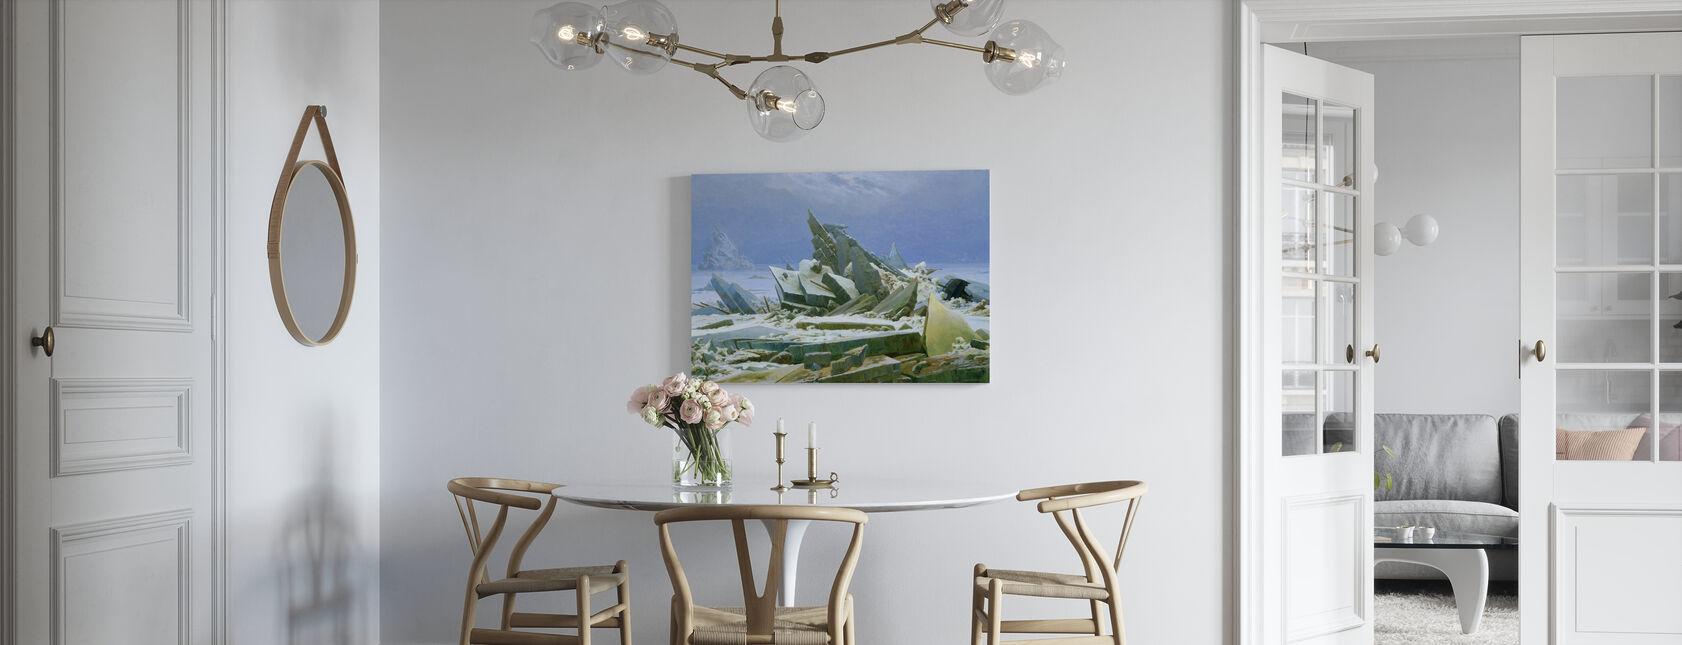 Polarhavet - Caspar Friedrich - Canvastavla - Kök